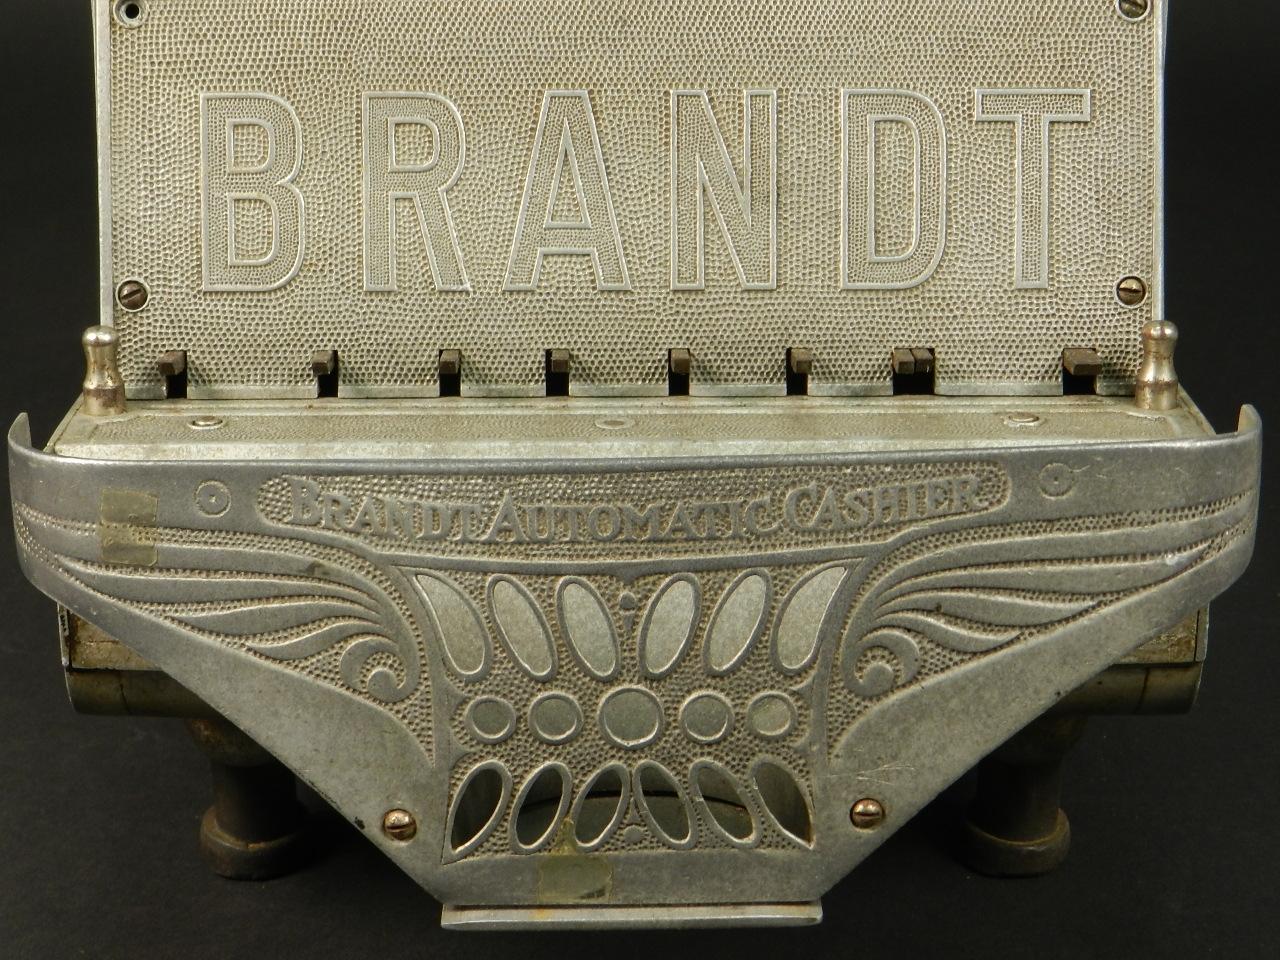 Imagen BRANDT AUTOMATIC CASHIER AÑO 1910 28066